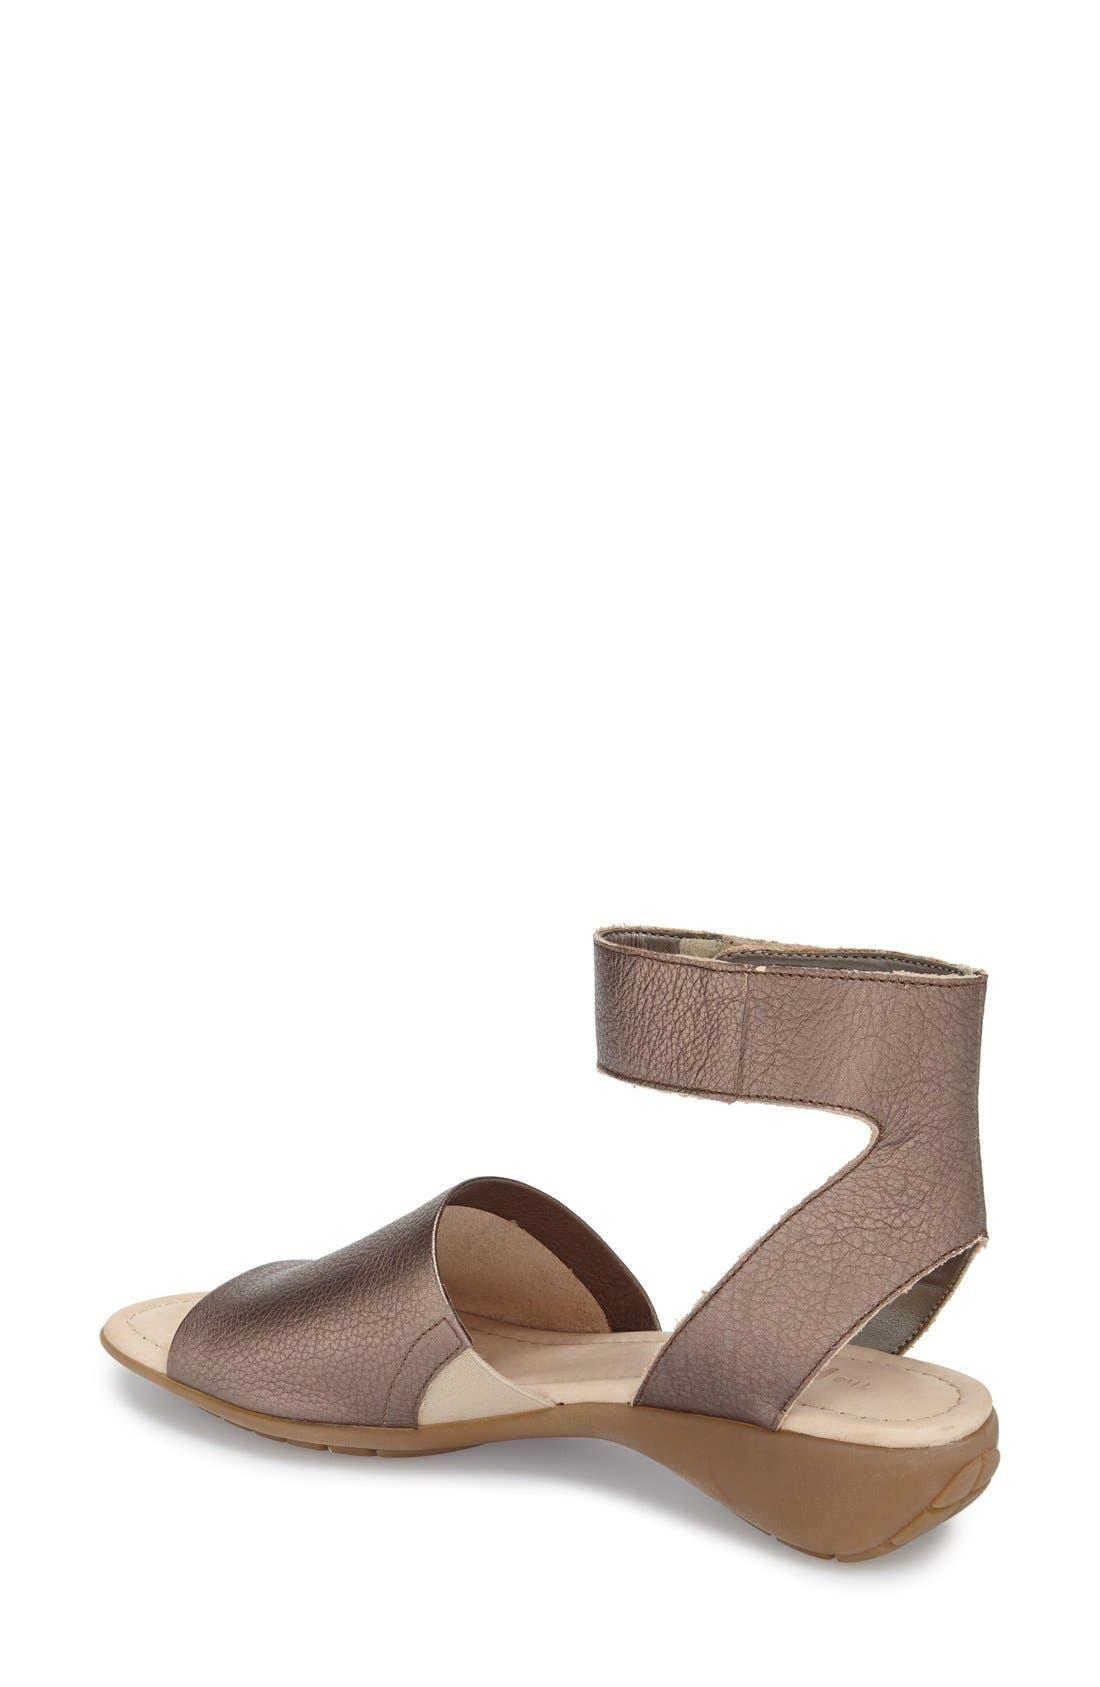 'Beglad' Leather Ankle Strap Sandal,                             Alternate thumbnail 24, color,